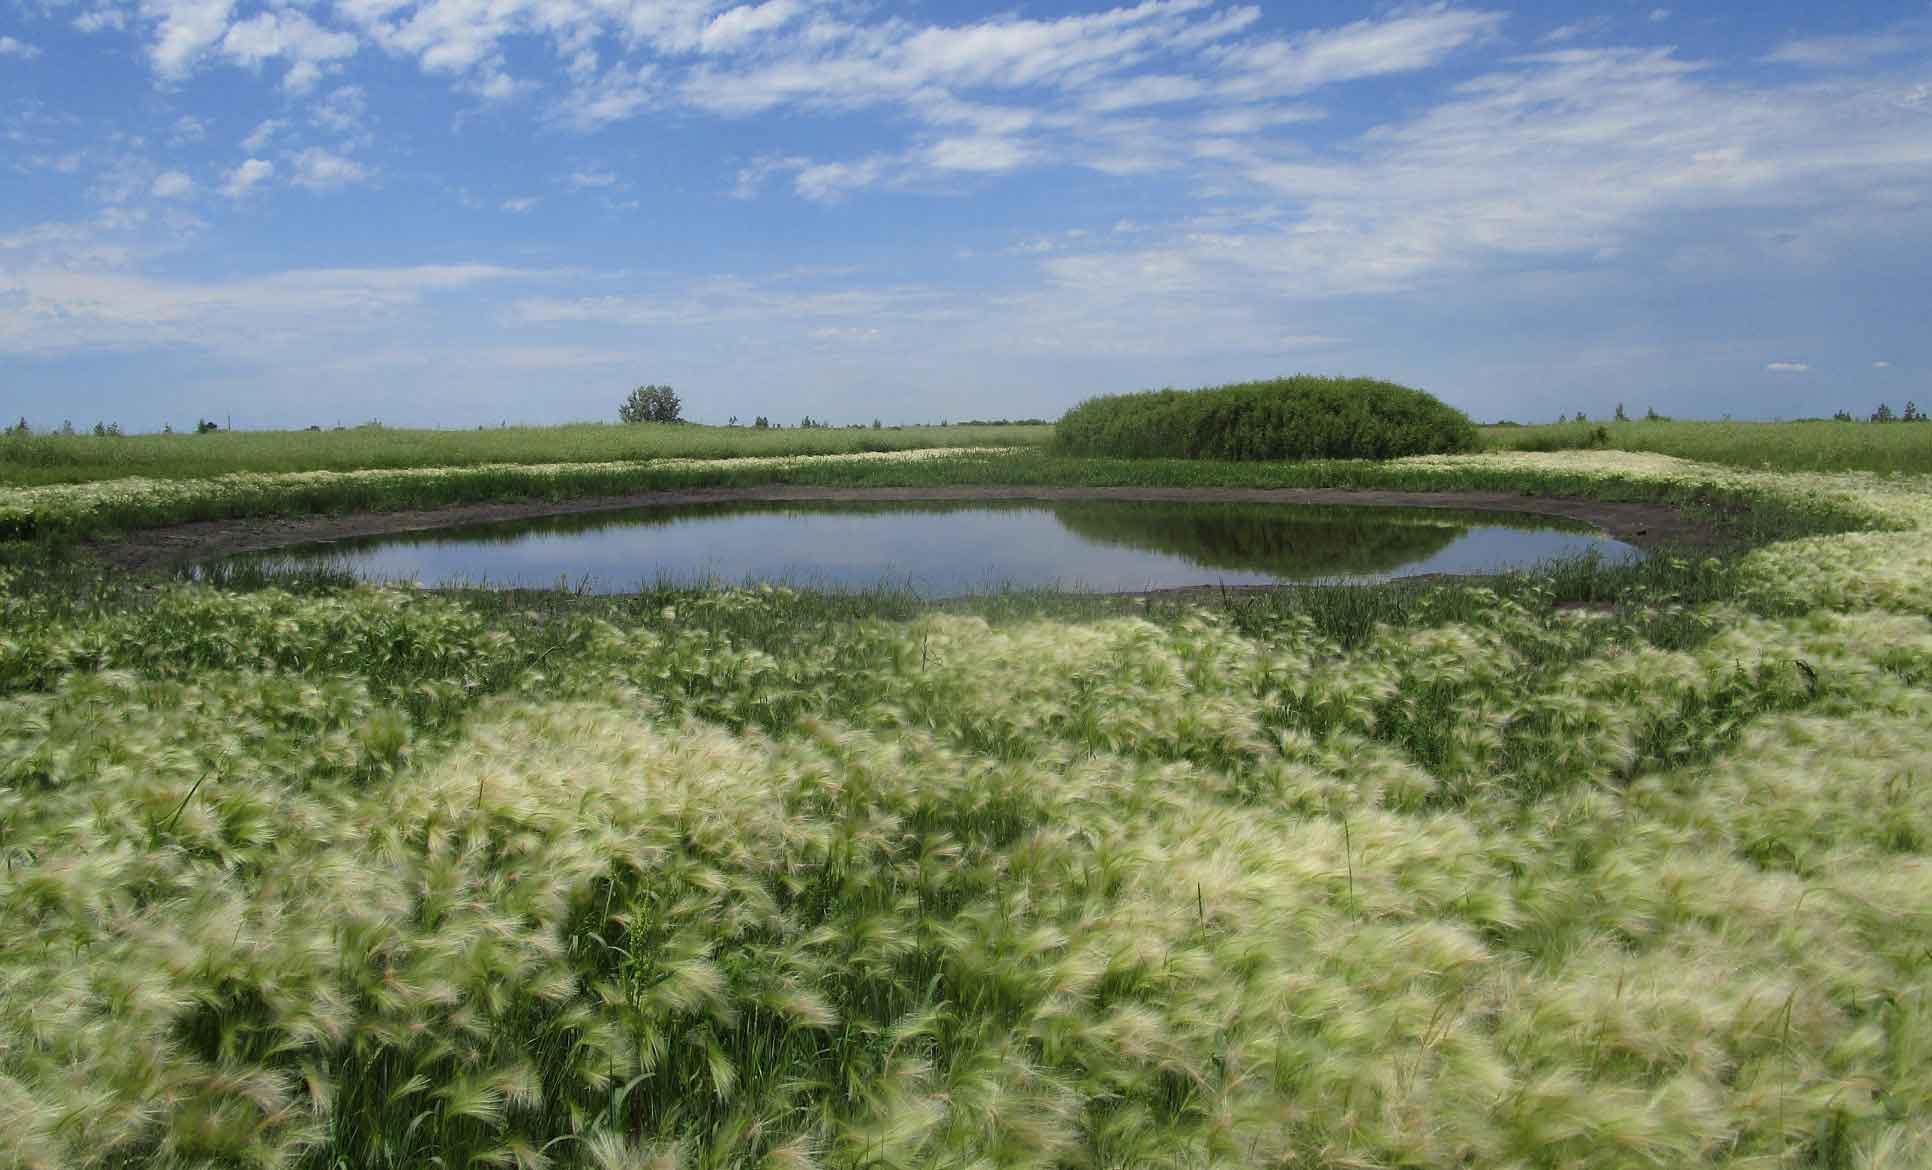 habitat photo of grassland with a shallow lake